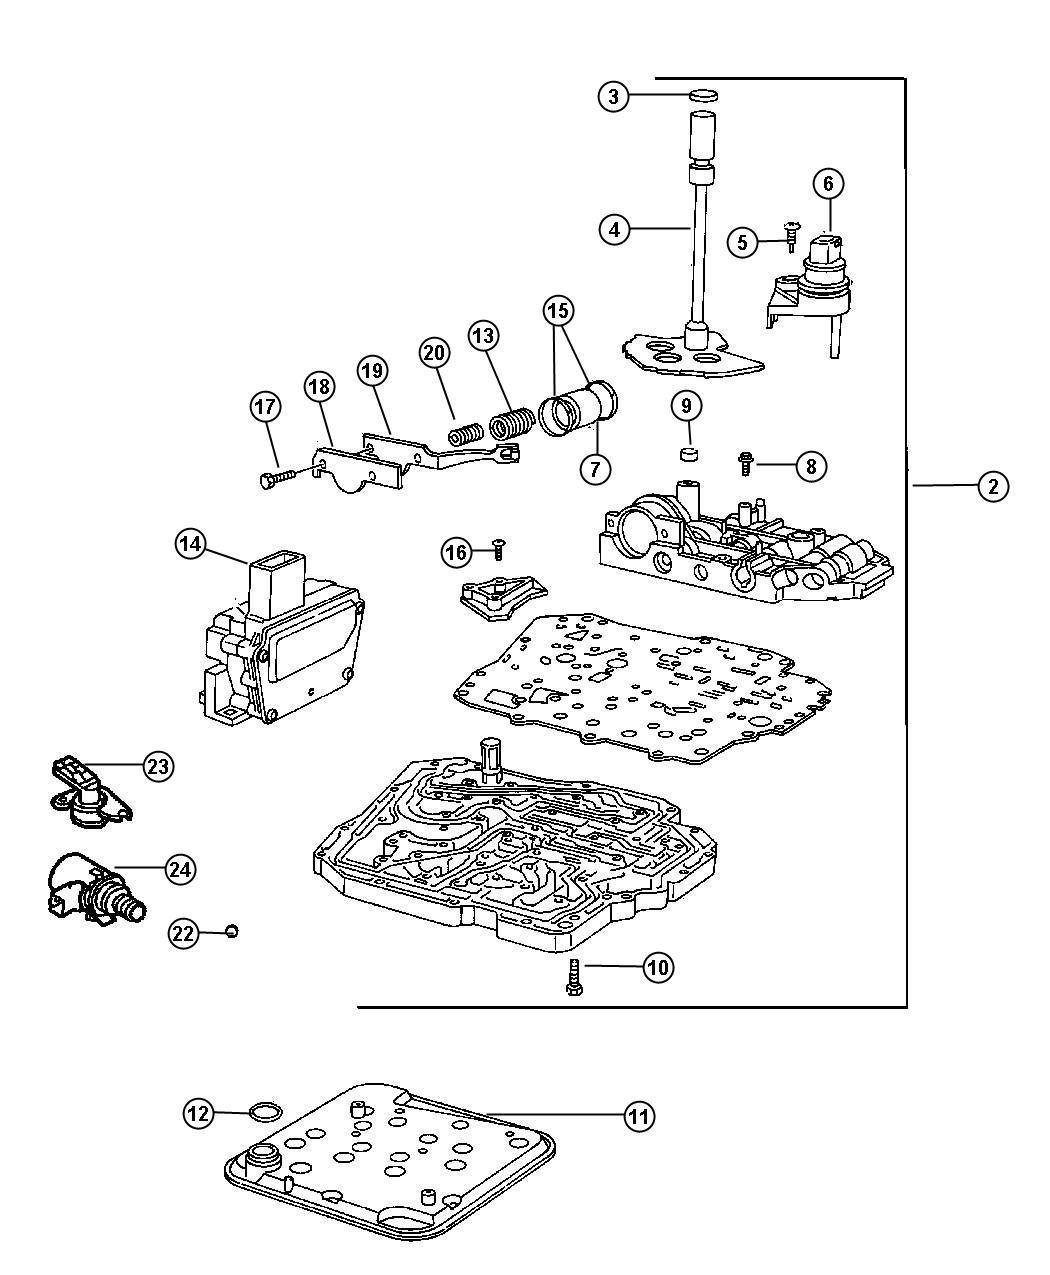 valve body#2000 dodge 46re transmission diagram#dodge 48re transmission  diagram#46re rebuilding diagram#46re valve body diagram spring#dodge 46re